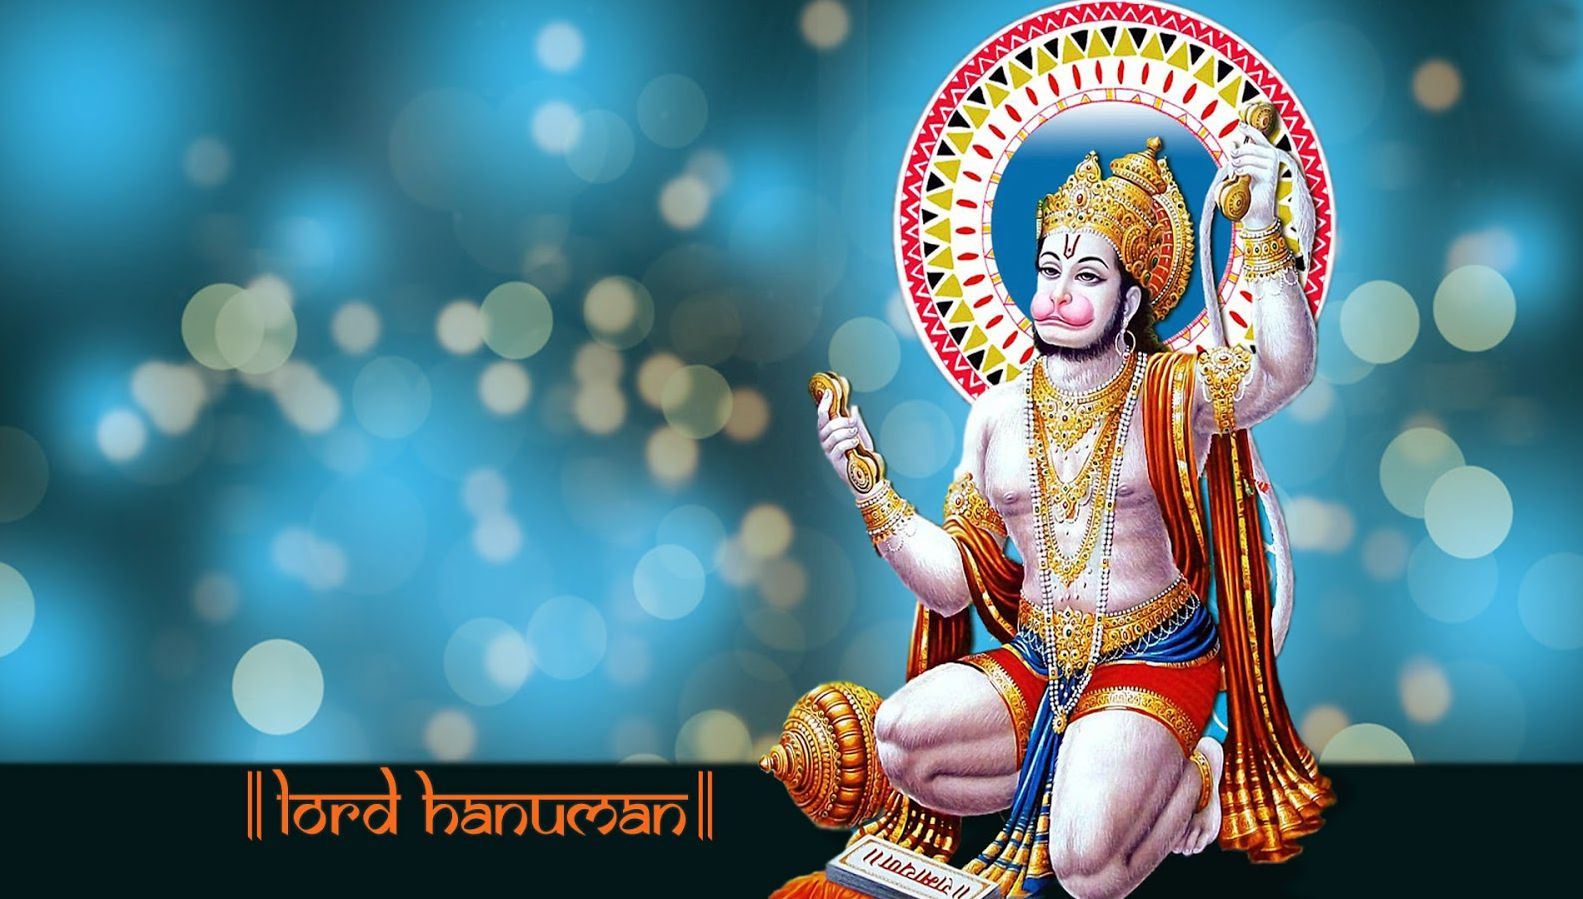 Lord Hanuman Photos Hd Hanuman Images Free Download